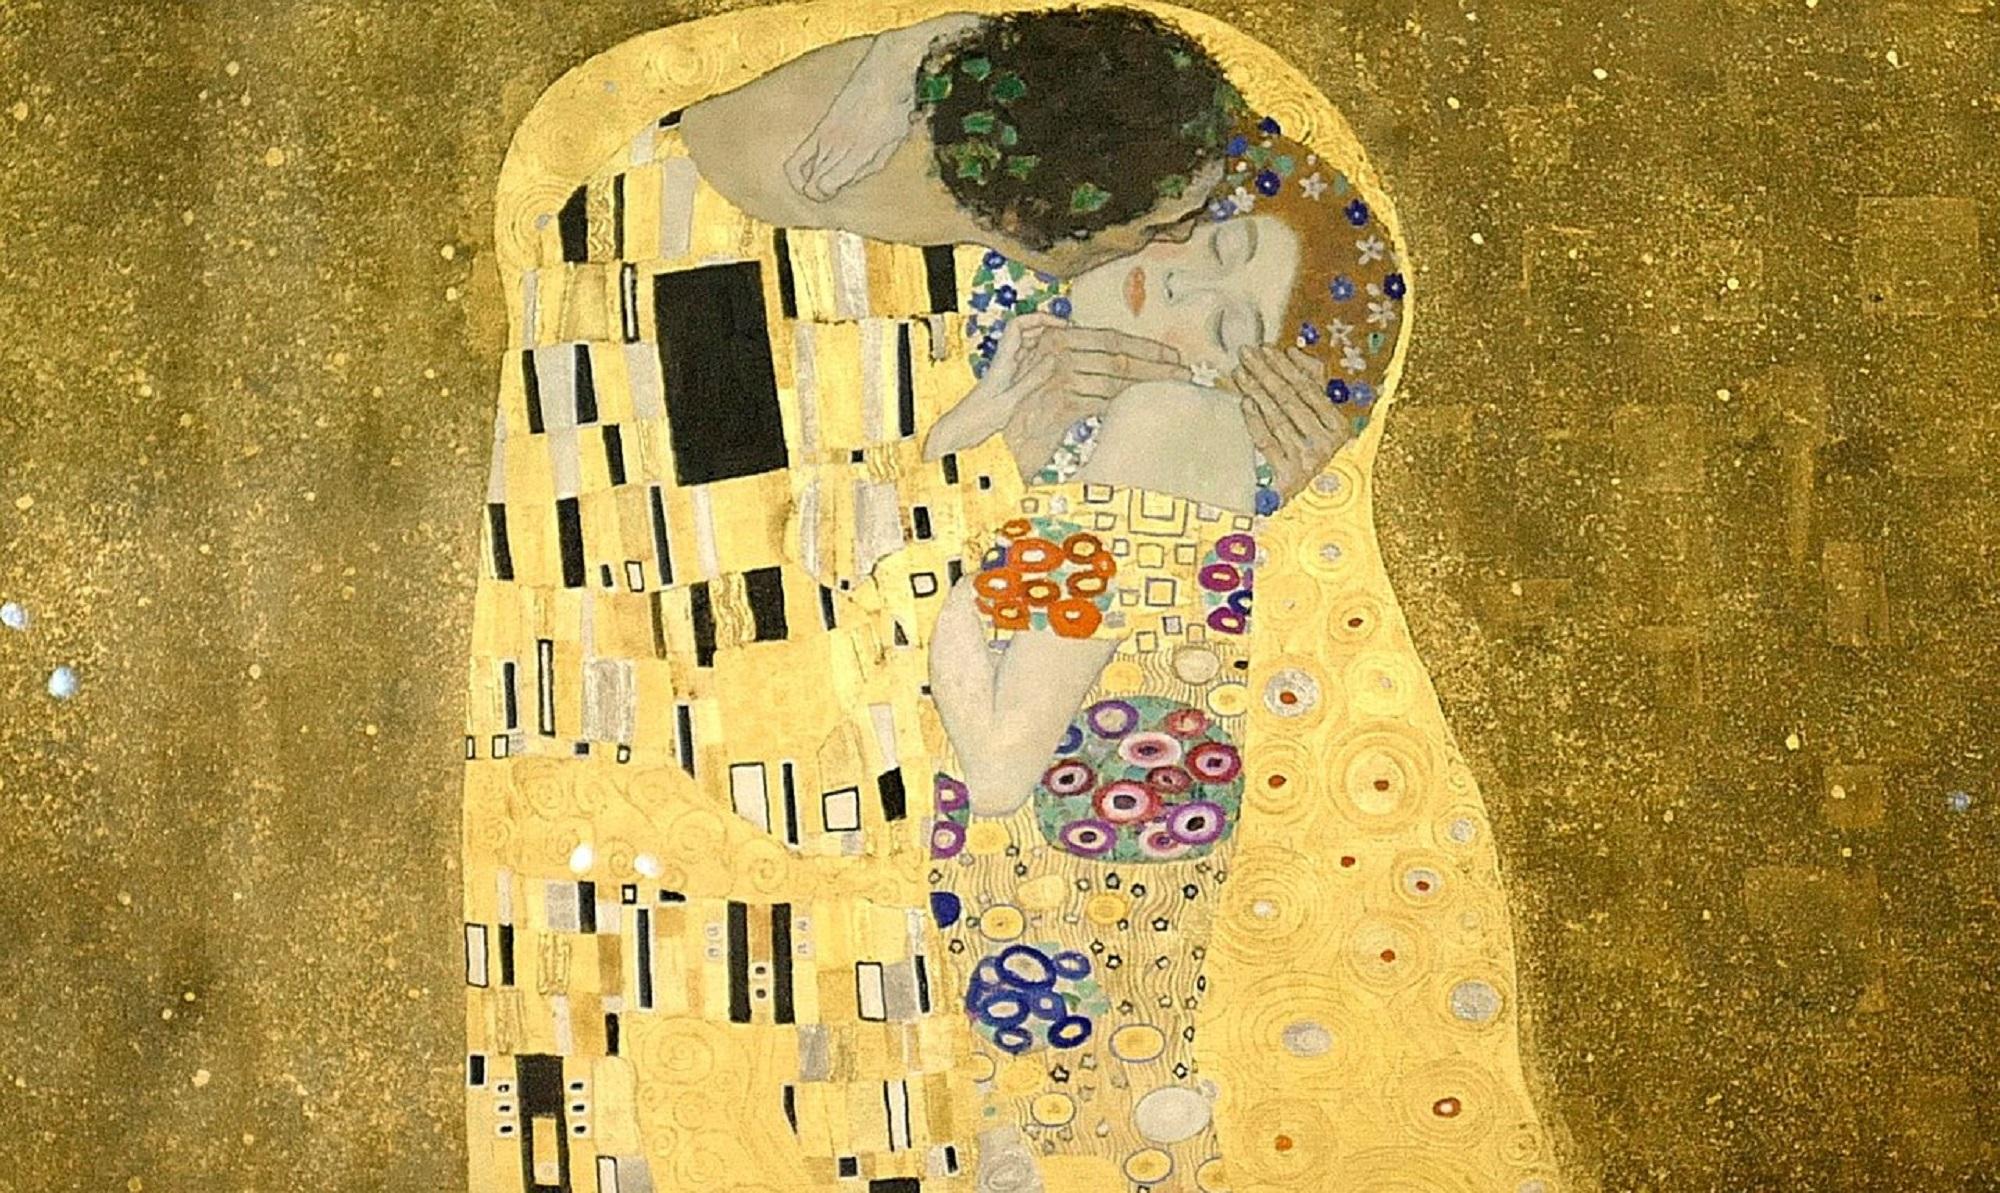 Da Klimt a Monet, da Escher a Jeff Koons. Le grandi mostre in arrivo in Italia